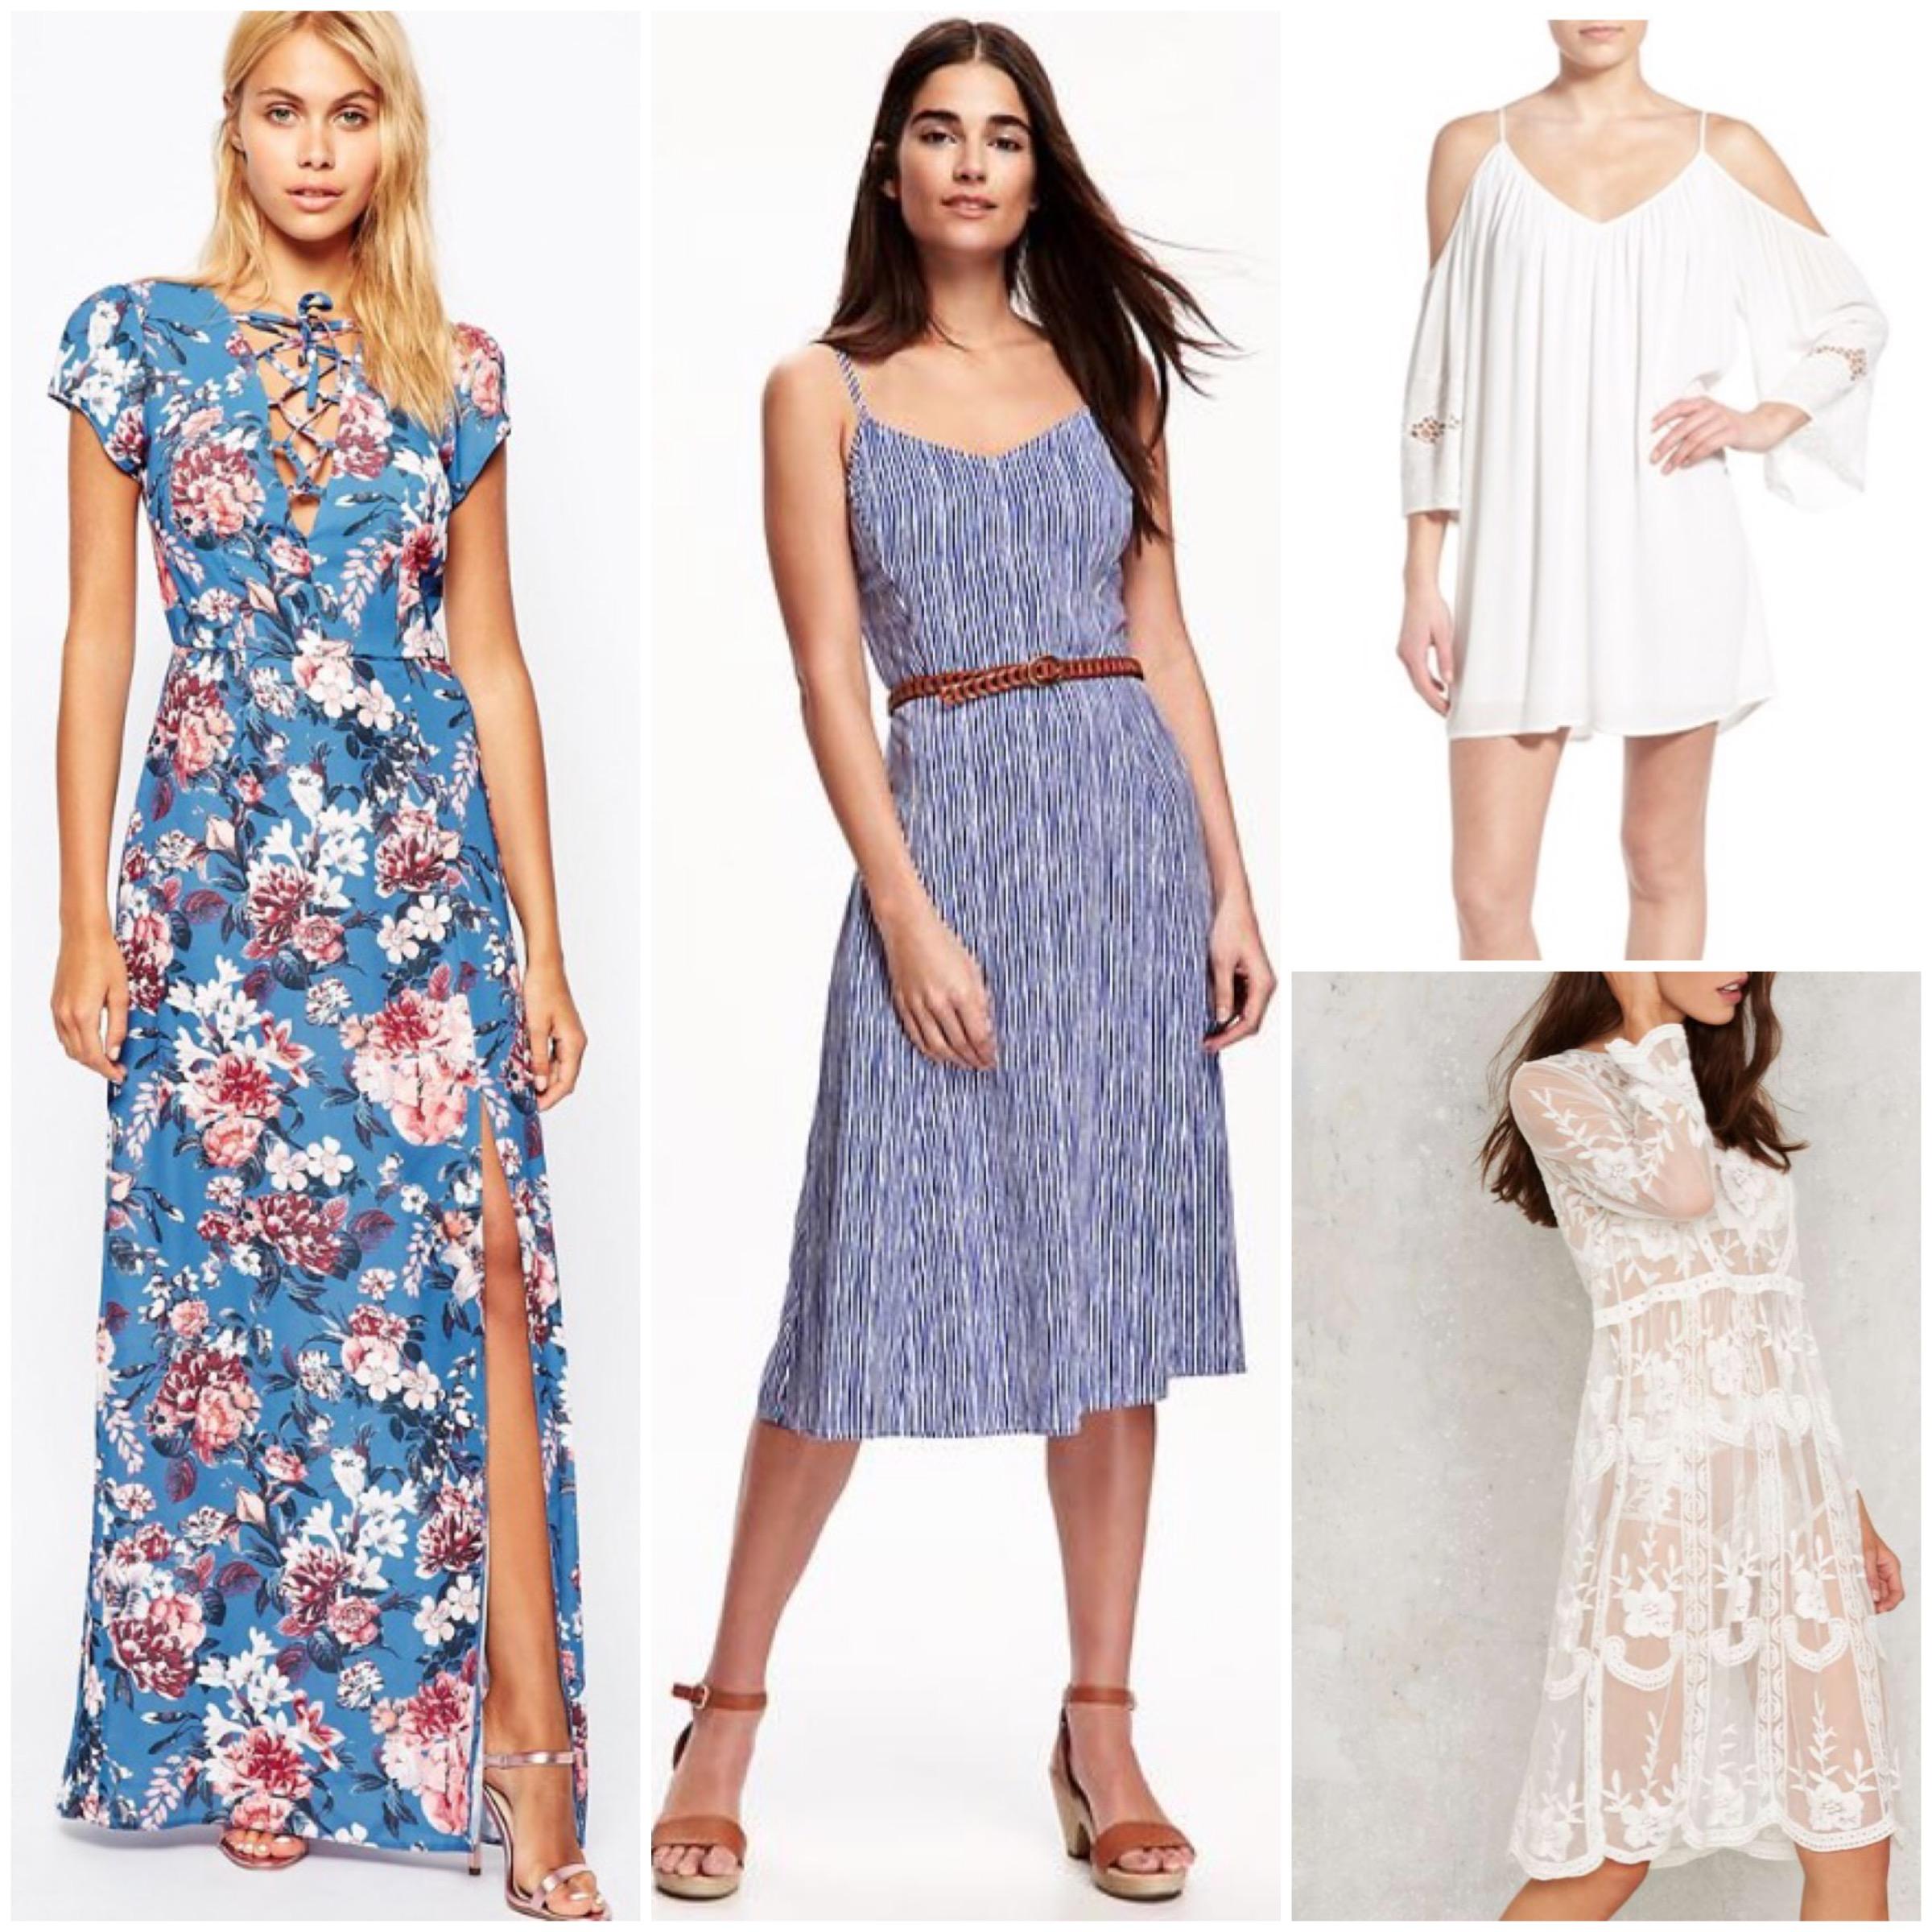 spring dresses shop, dresses, spring, dress, old navy, diane von furstenberg, sazan EZHDRPE